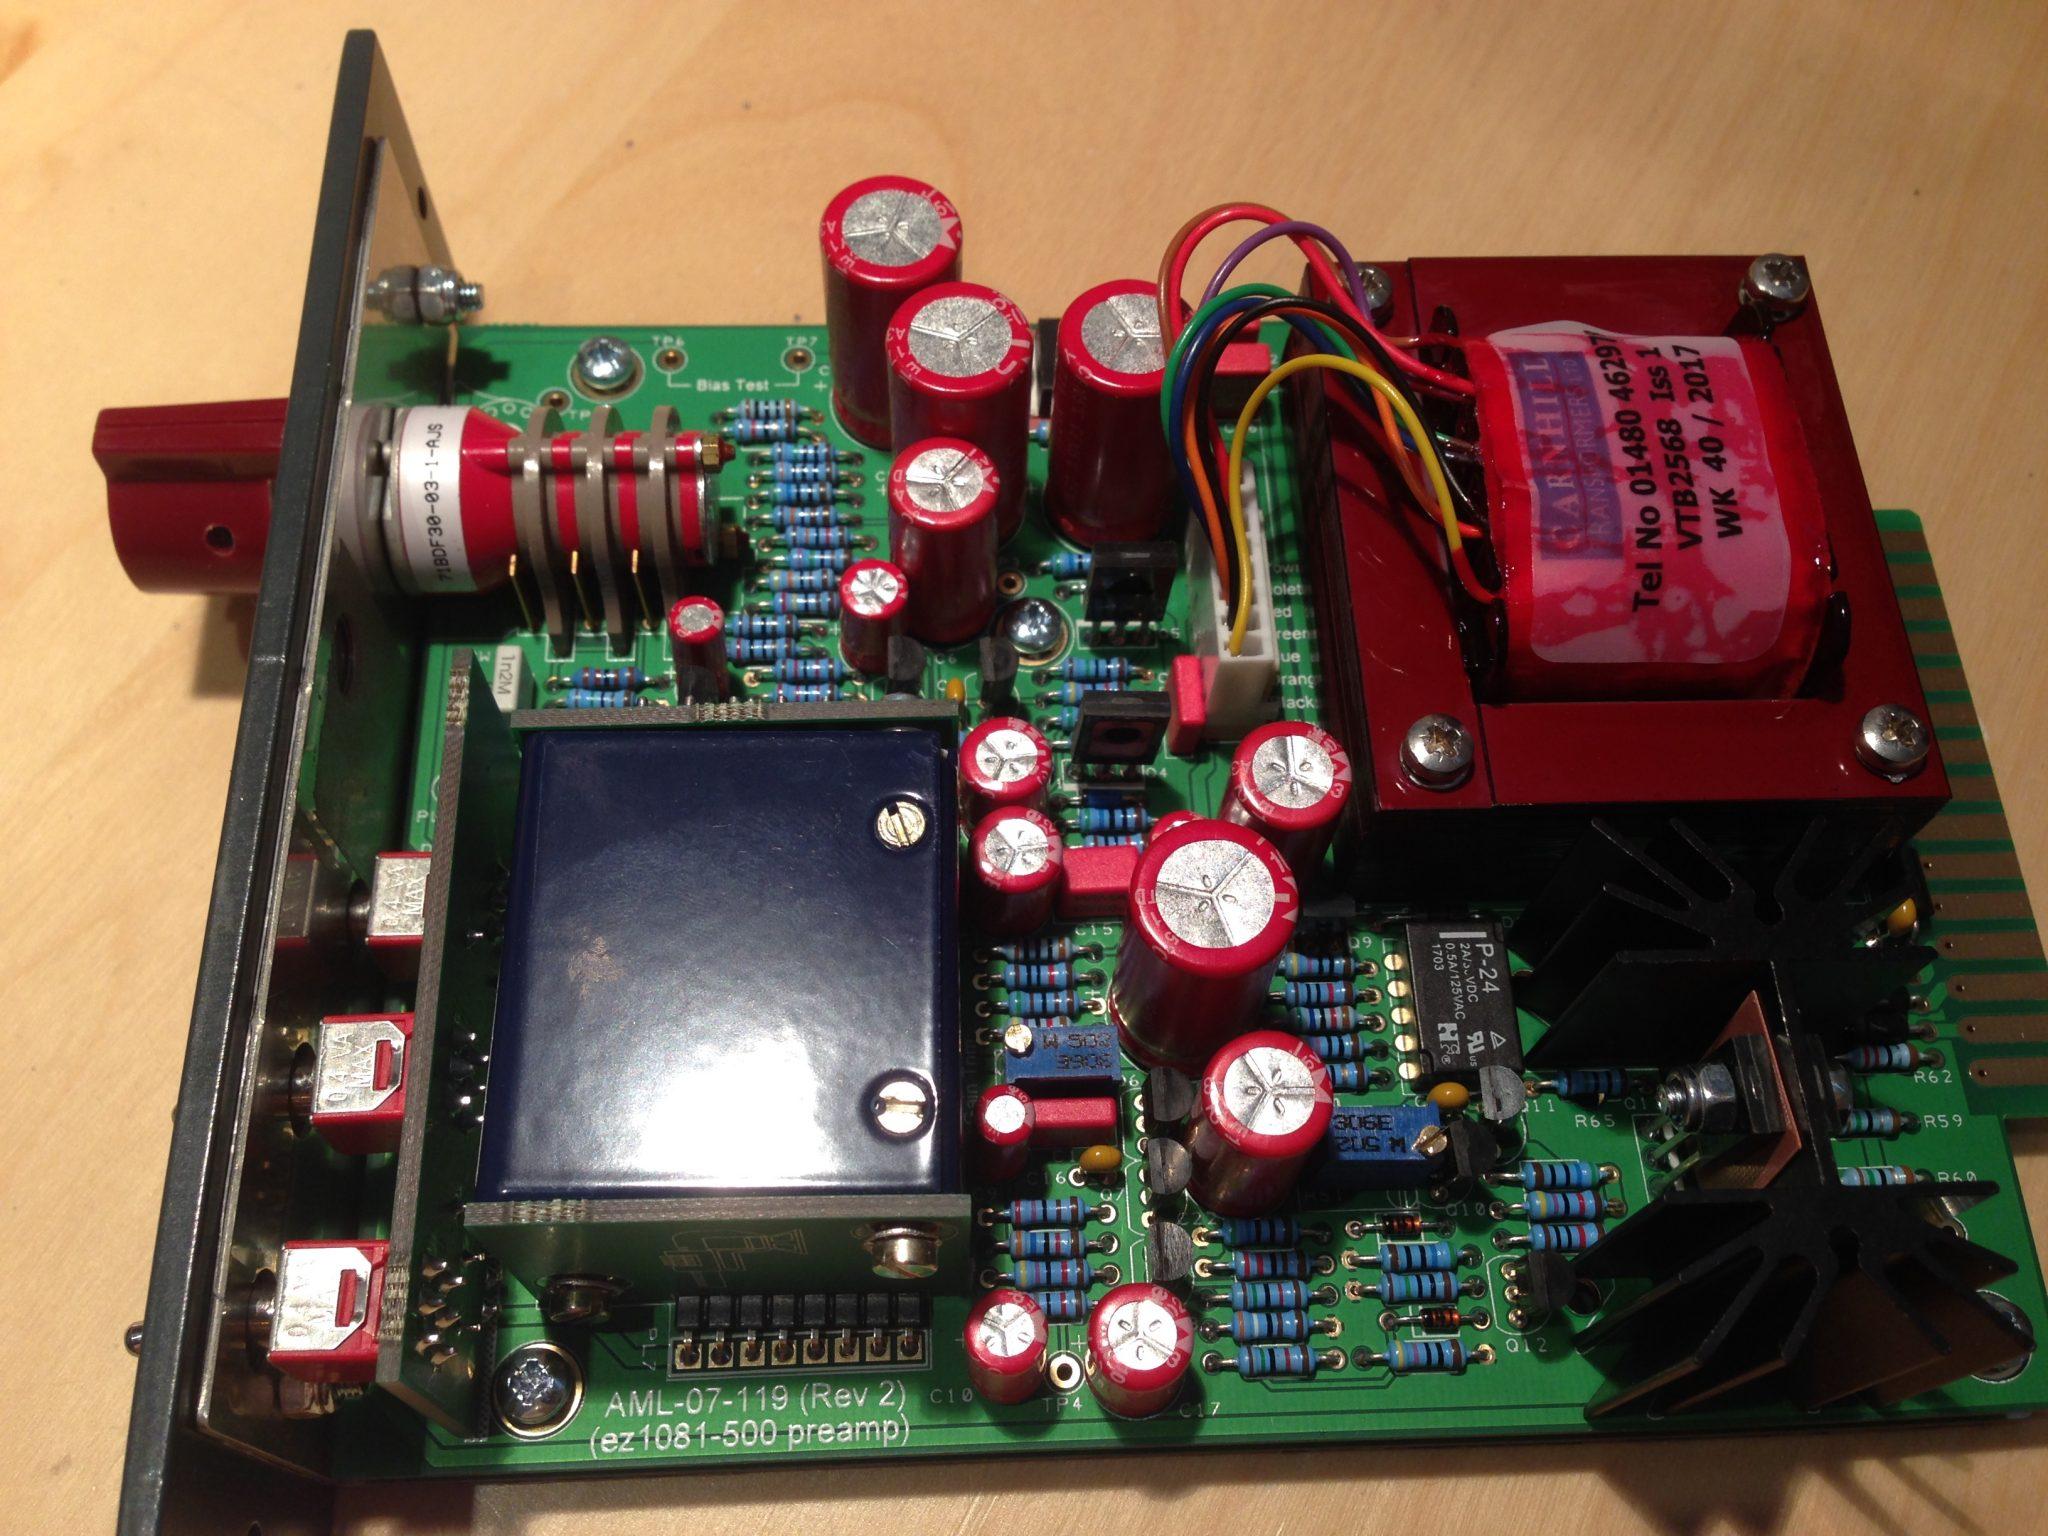 5 DIY audio kits to improve your recording - Threecircles